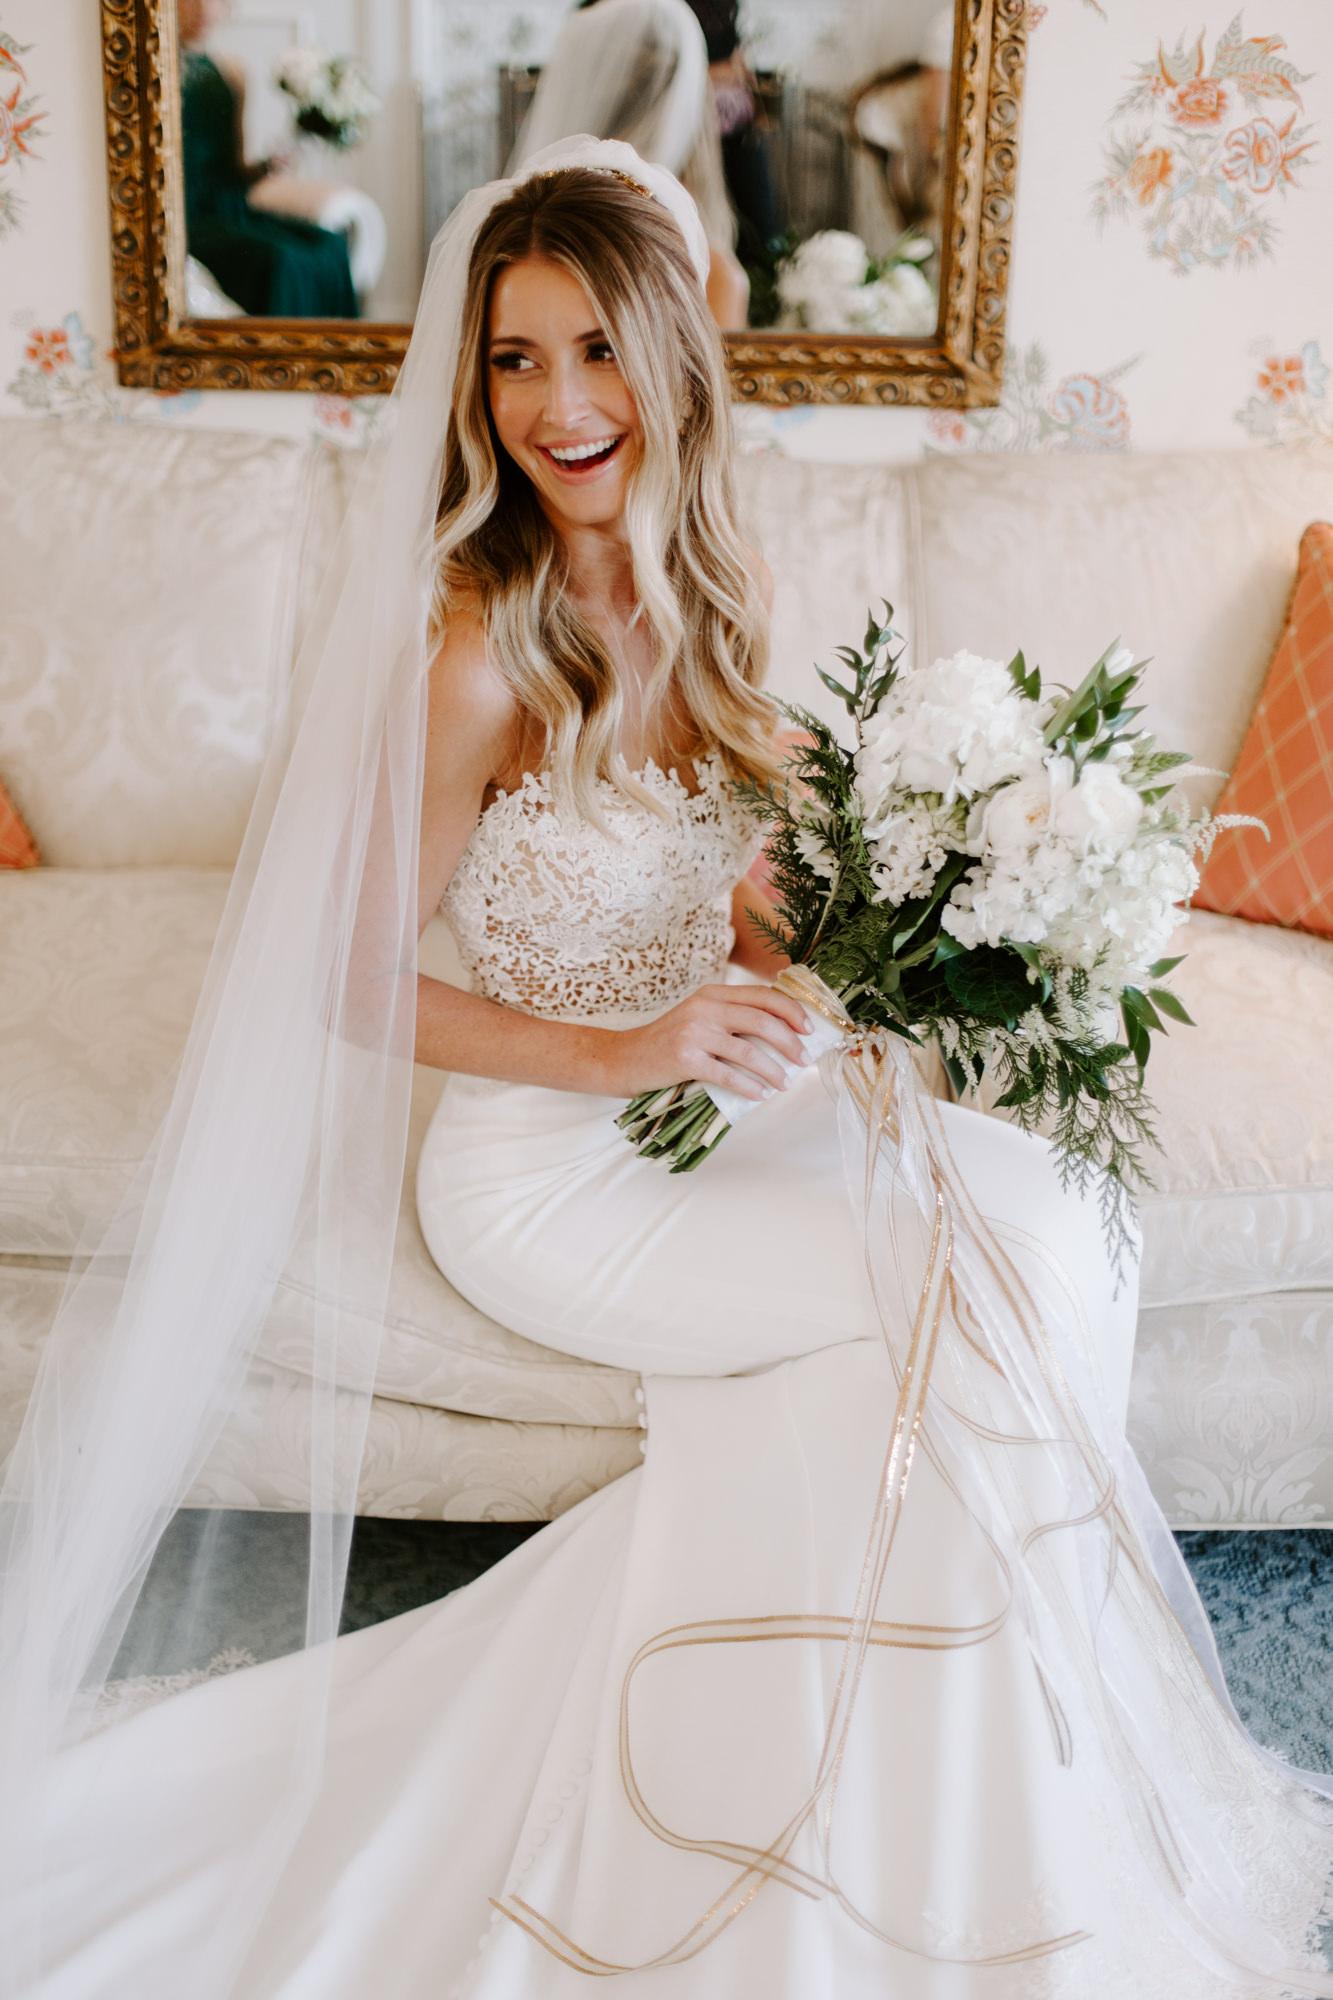 San Diego Wedding photography at The Darlington House028.jpg